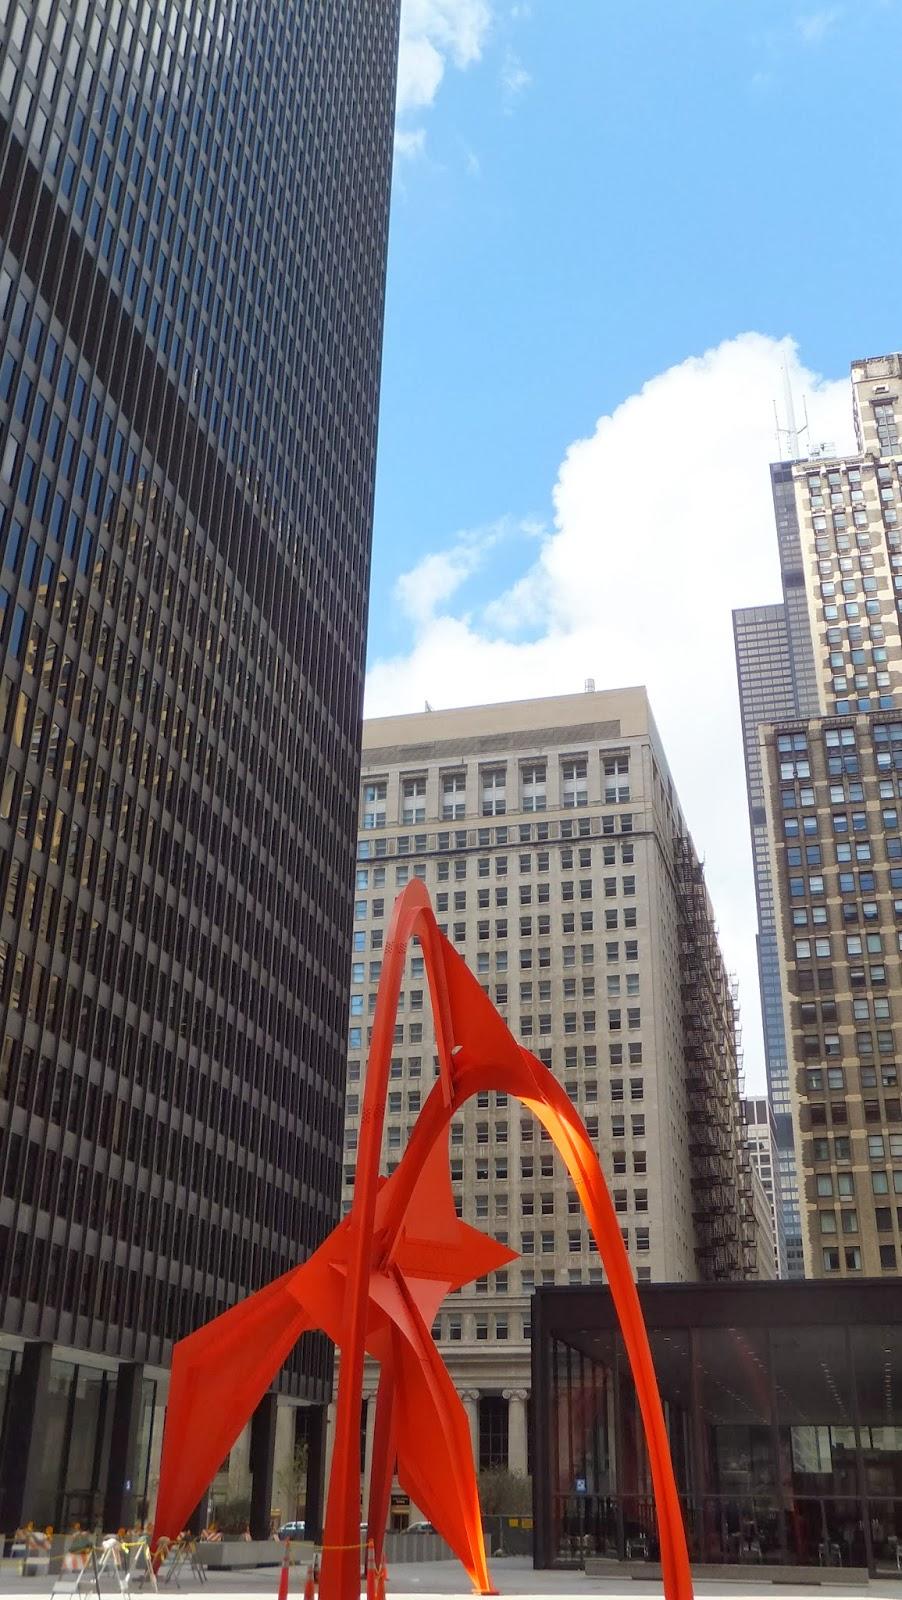 Flamingo, Alexander Calder, Chicago, Street Art, Elisa N, Blog de Viajes, Lifestyle, Travel